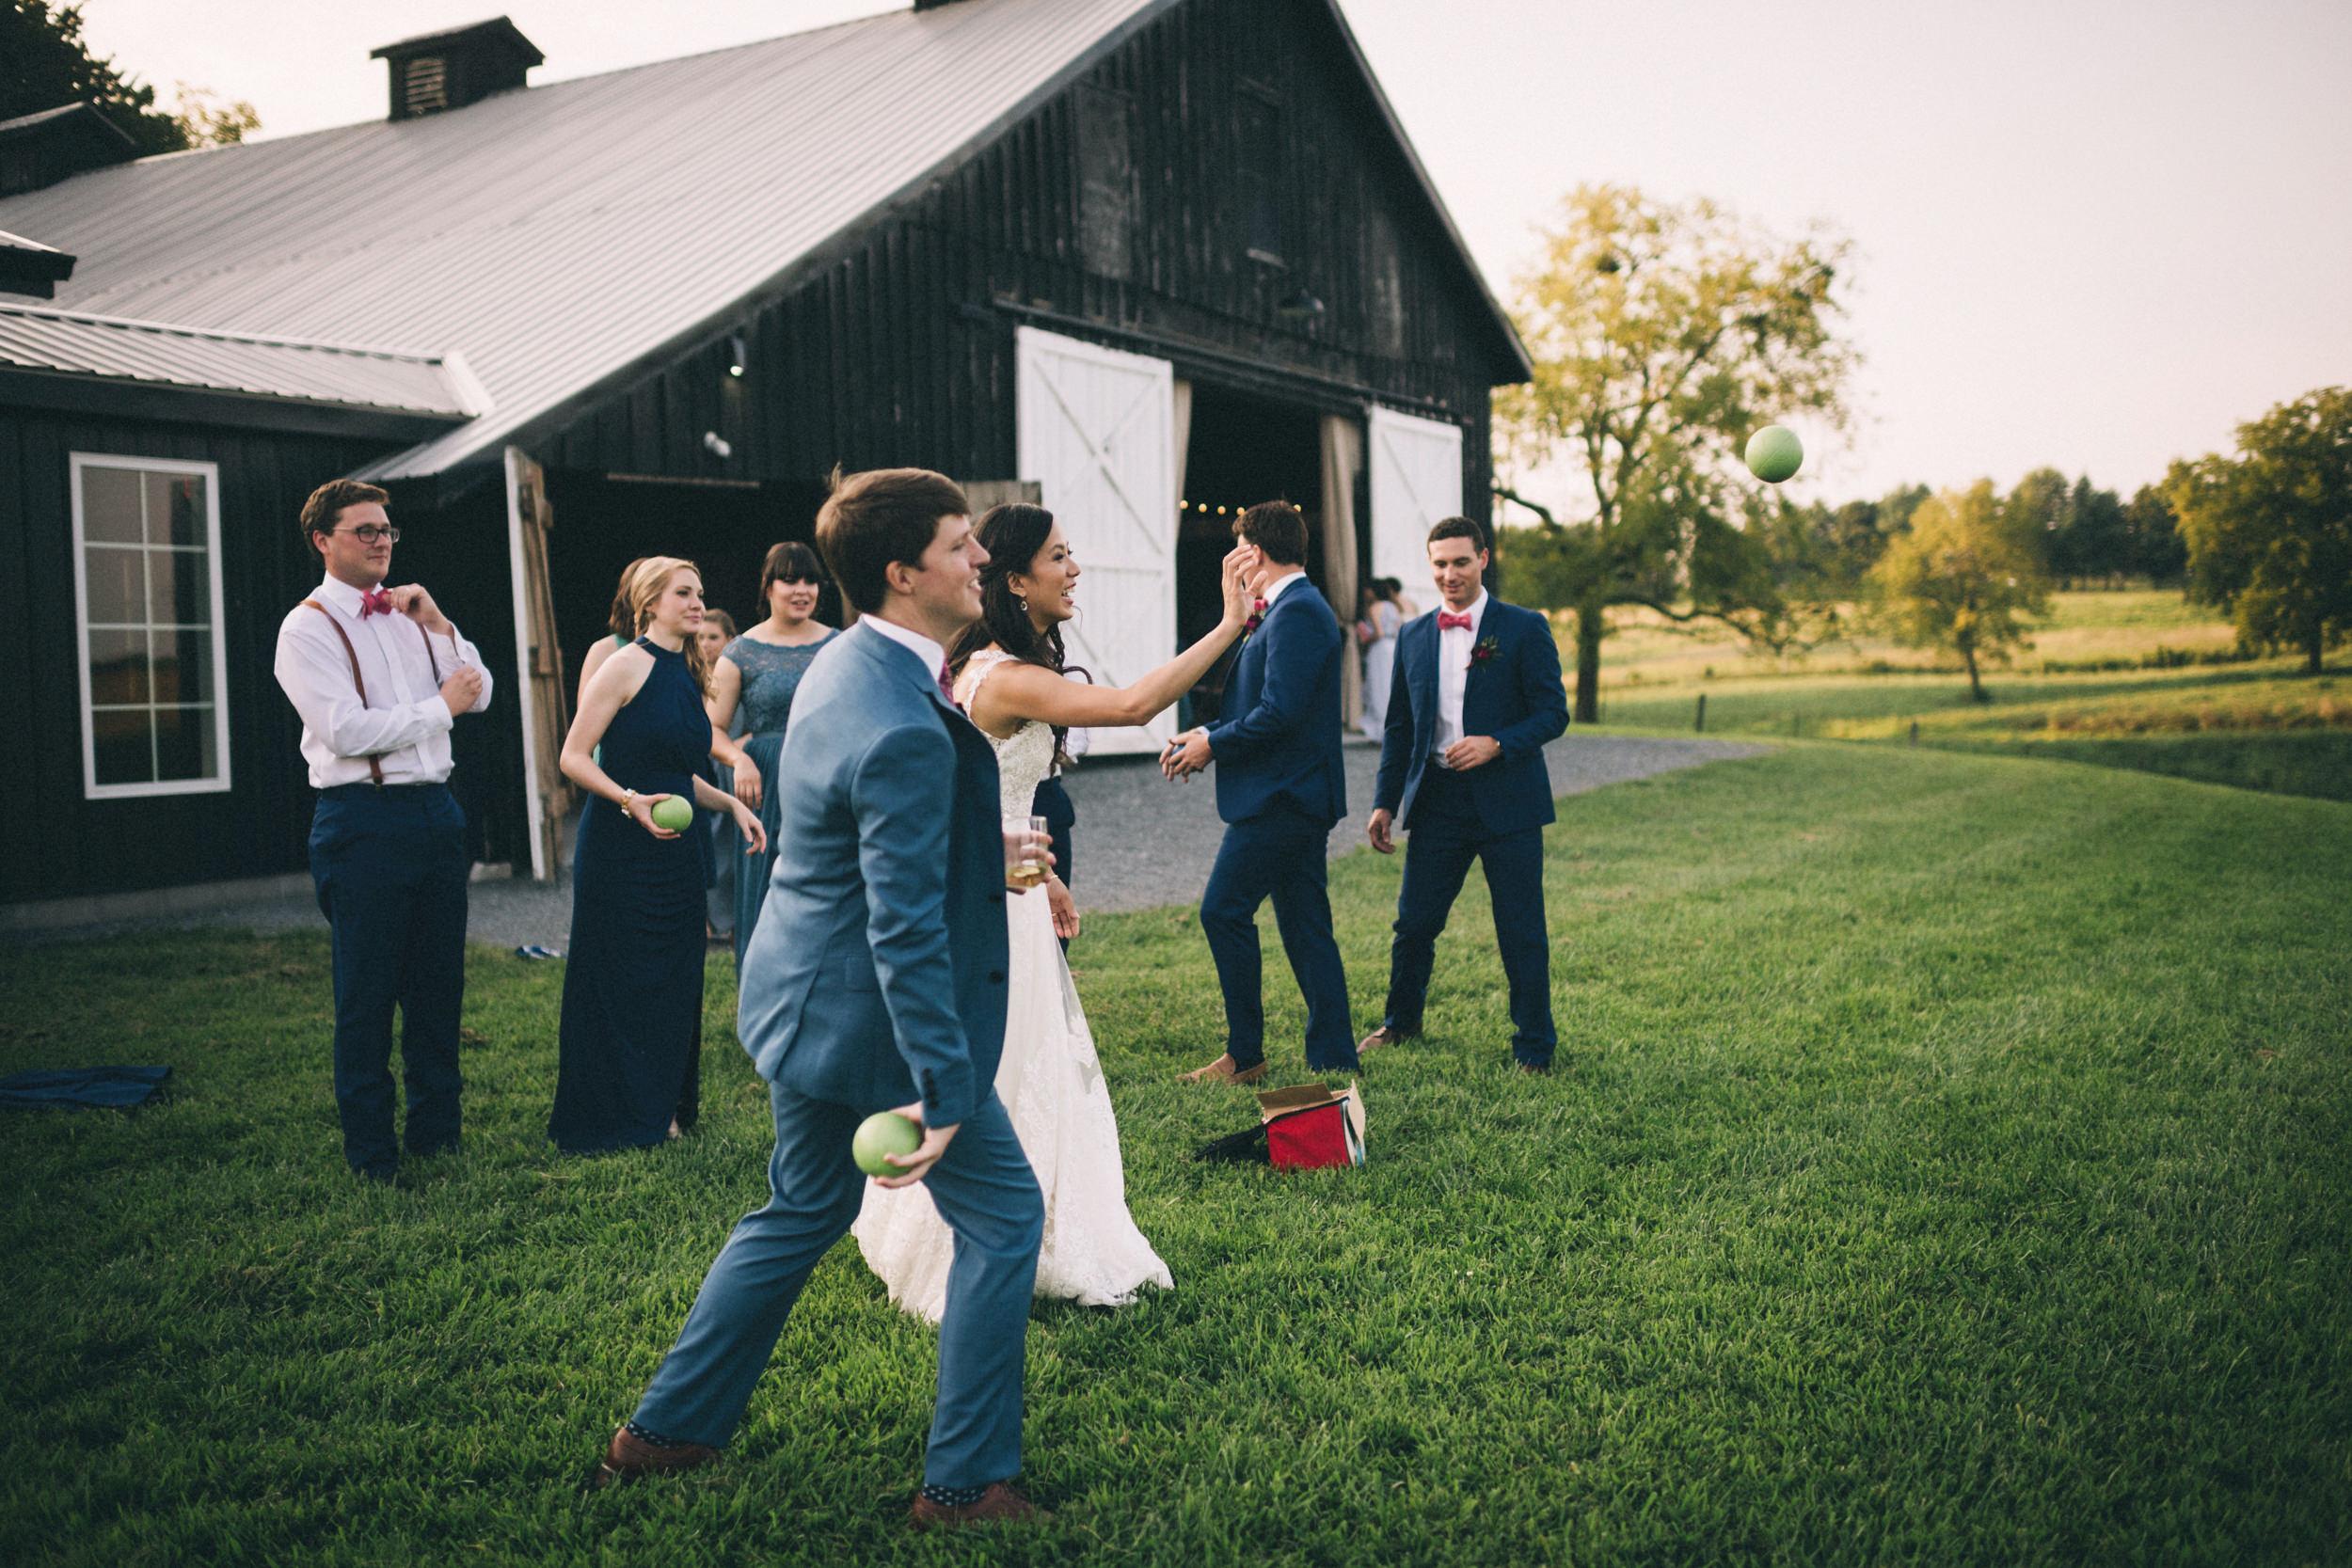 Louisville-Kentucky-Wedding-and-Elopement-Photographer-Sarah-Katherine-Davis-Photography-Summer-Jewel-Toned-Wedding-Chineese-Tea-Ceremony-Warrenwood-Manor-Danville-739.jpg